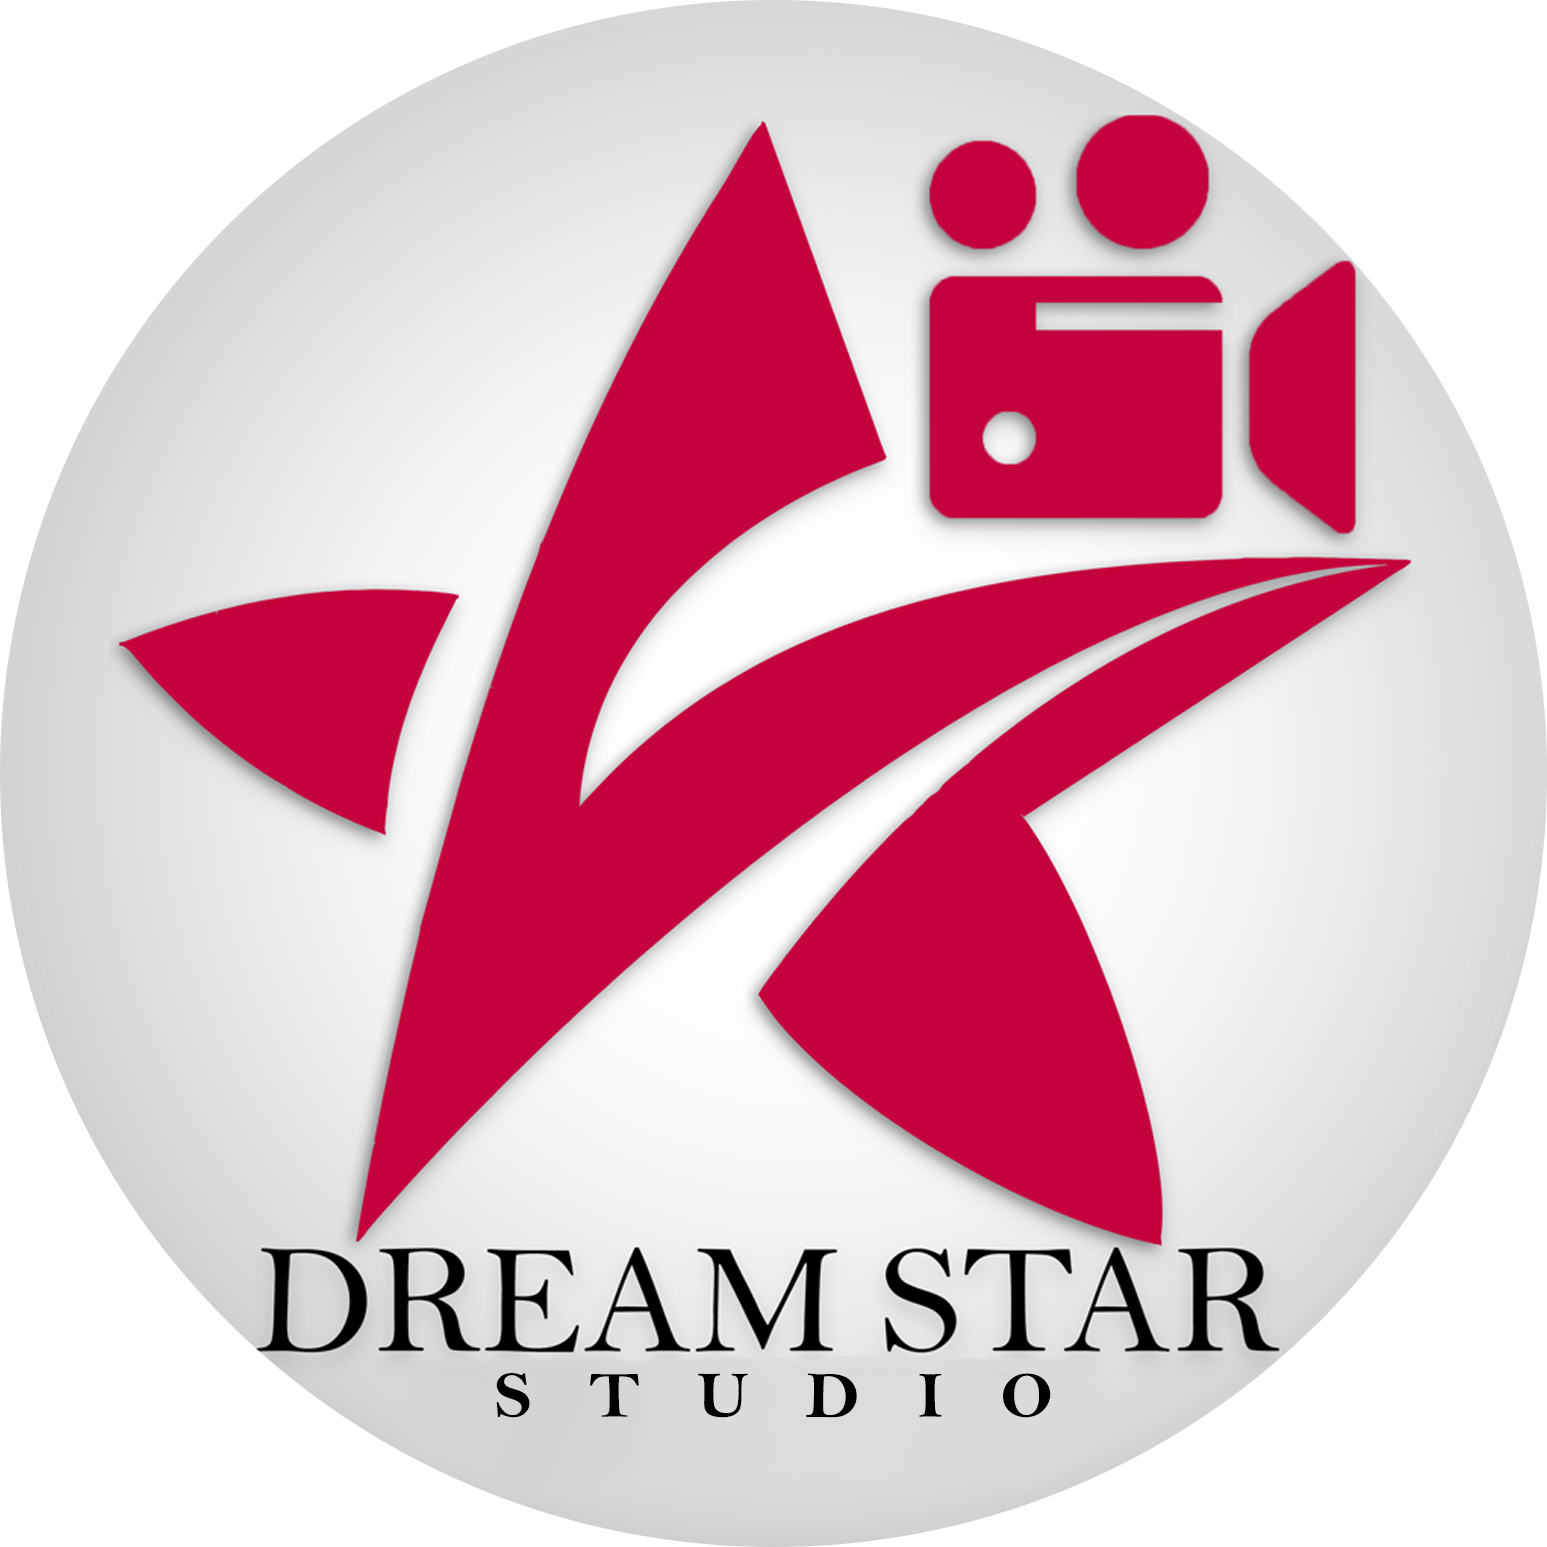 Dream Star Studio | Entertainment News in Bengali (বিনোদনের খবর), Latest Tollywood News, Bangla News